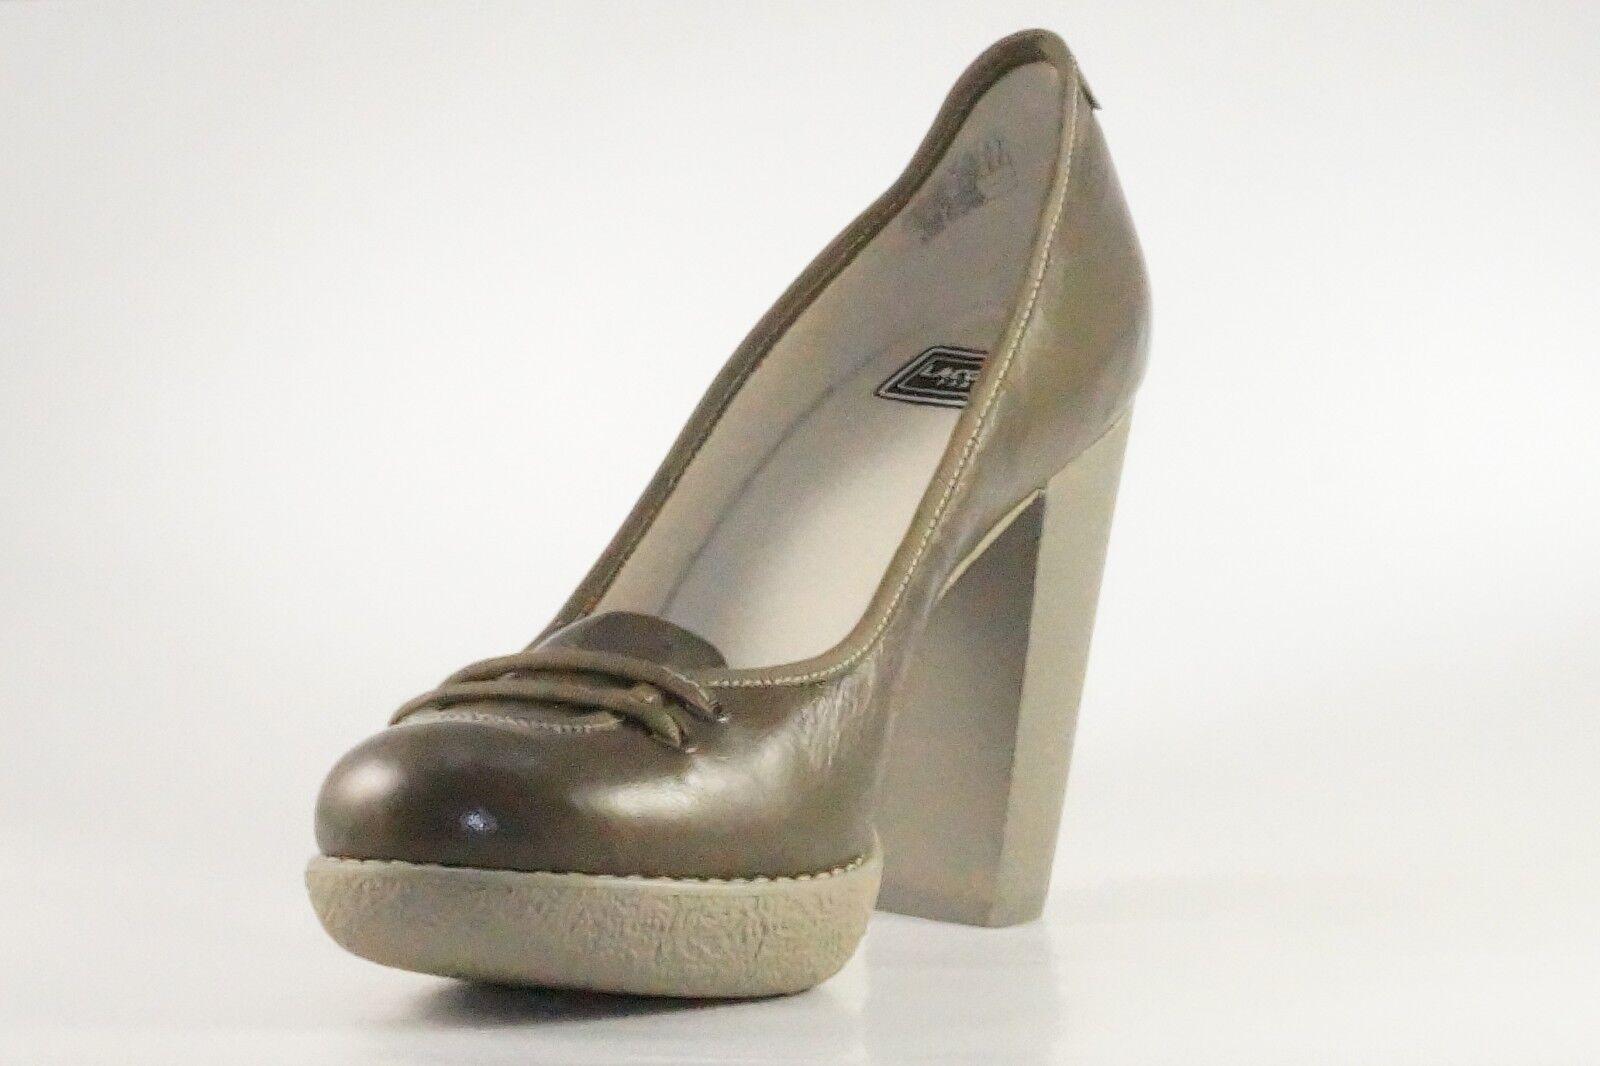 LACOSTE MISSIE GLOSS KID 37.5-40.5 NEU pumps high heels alisos ekani barbuda